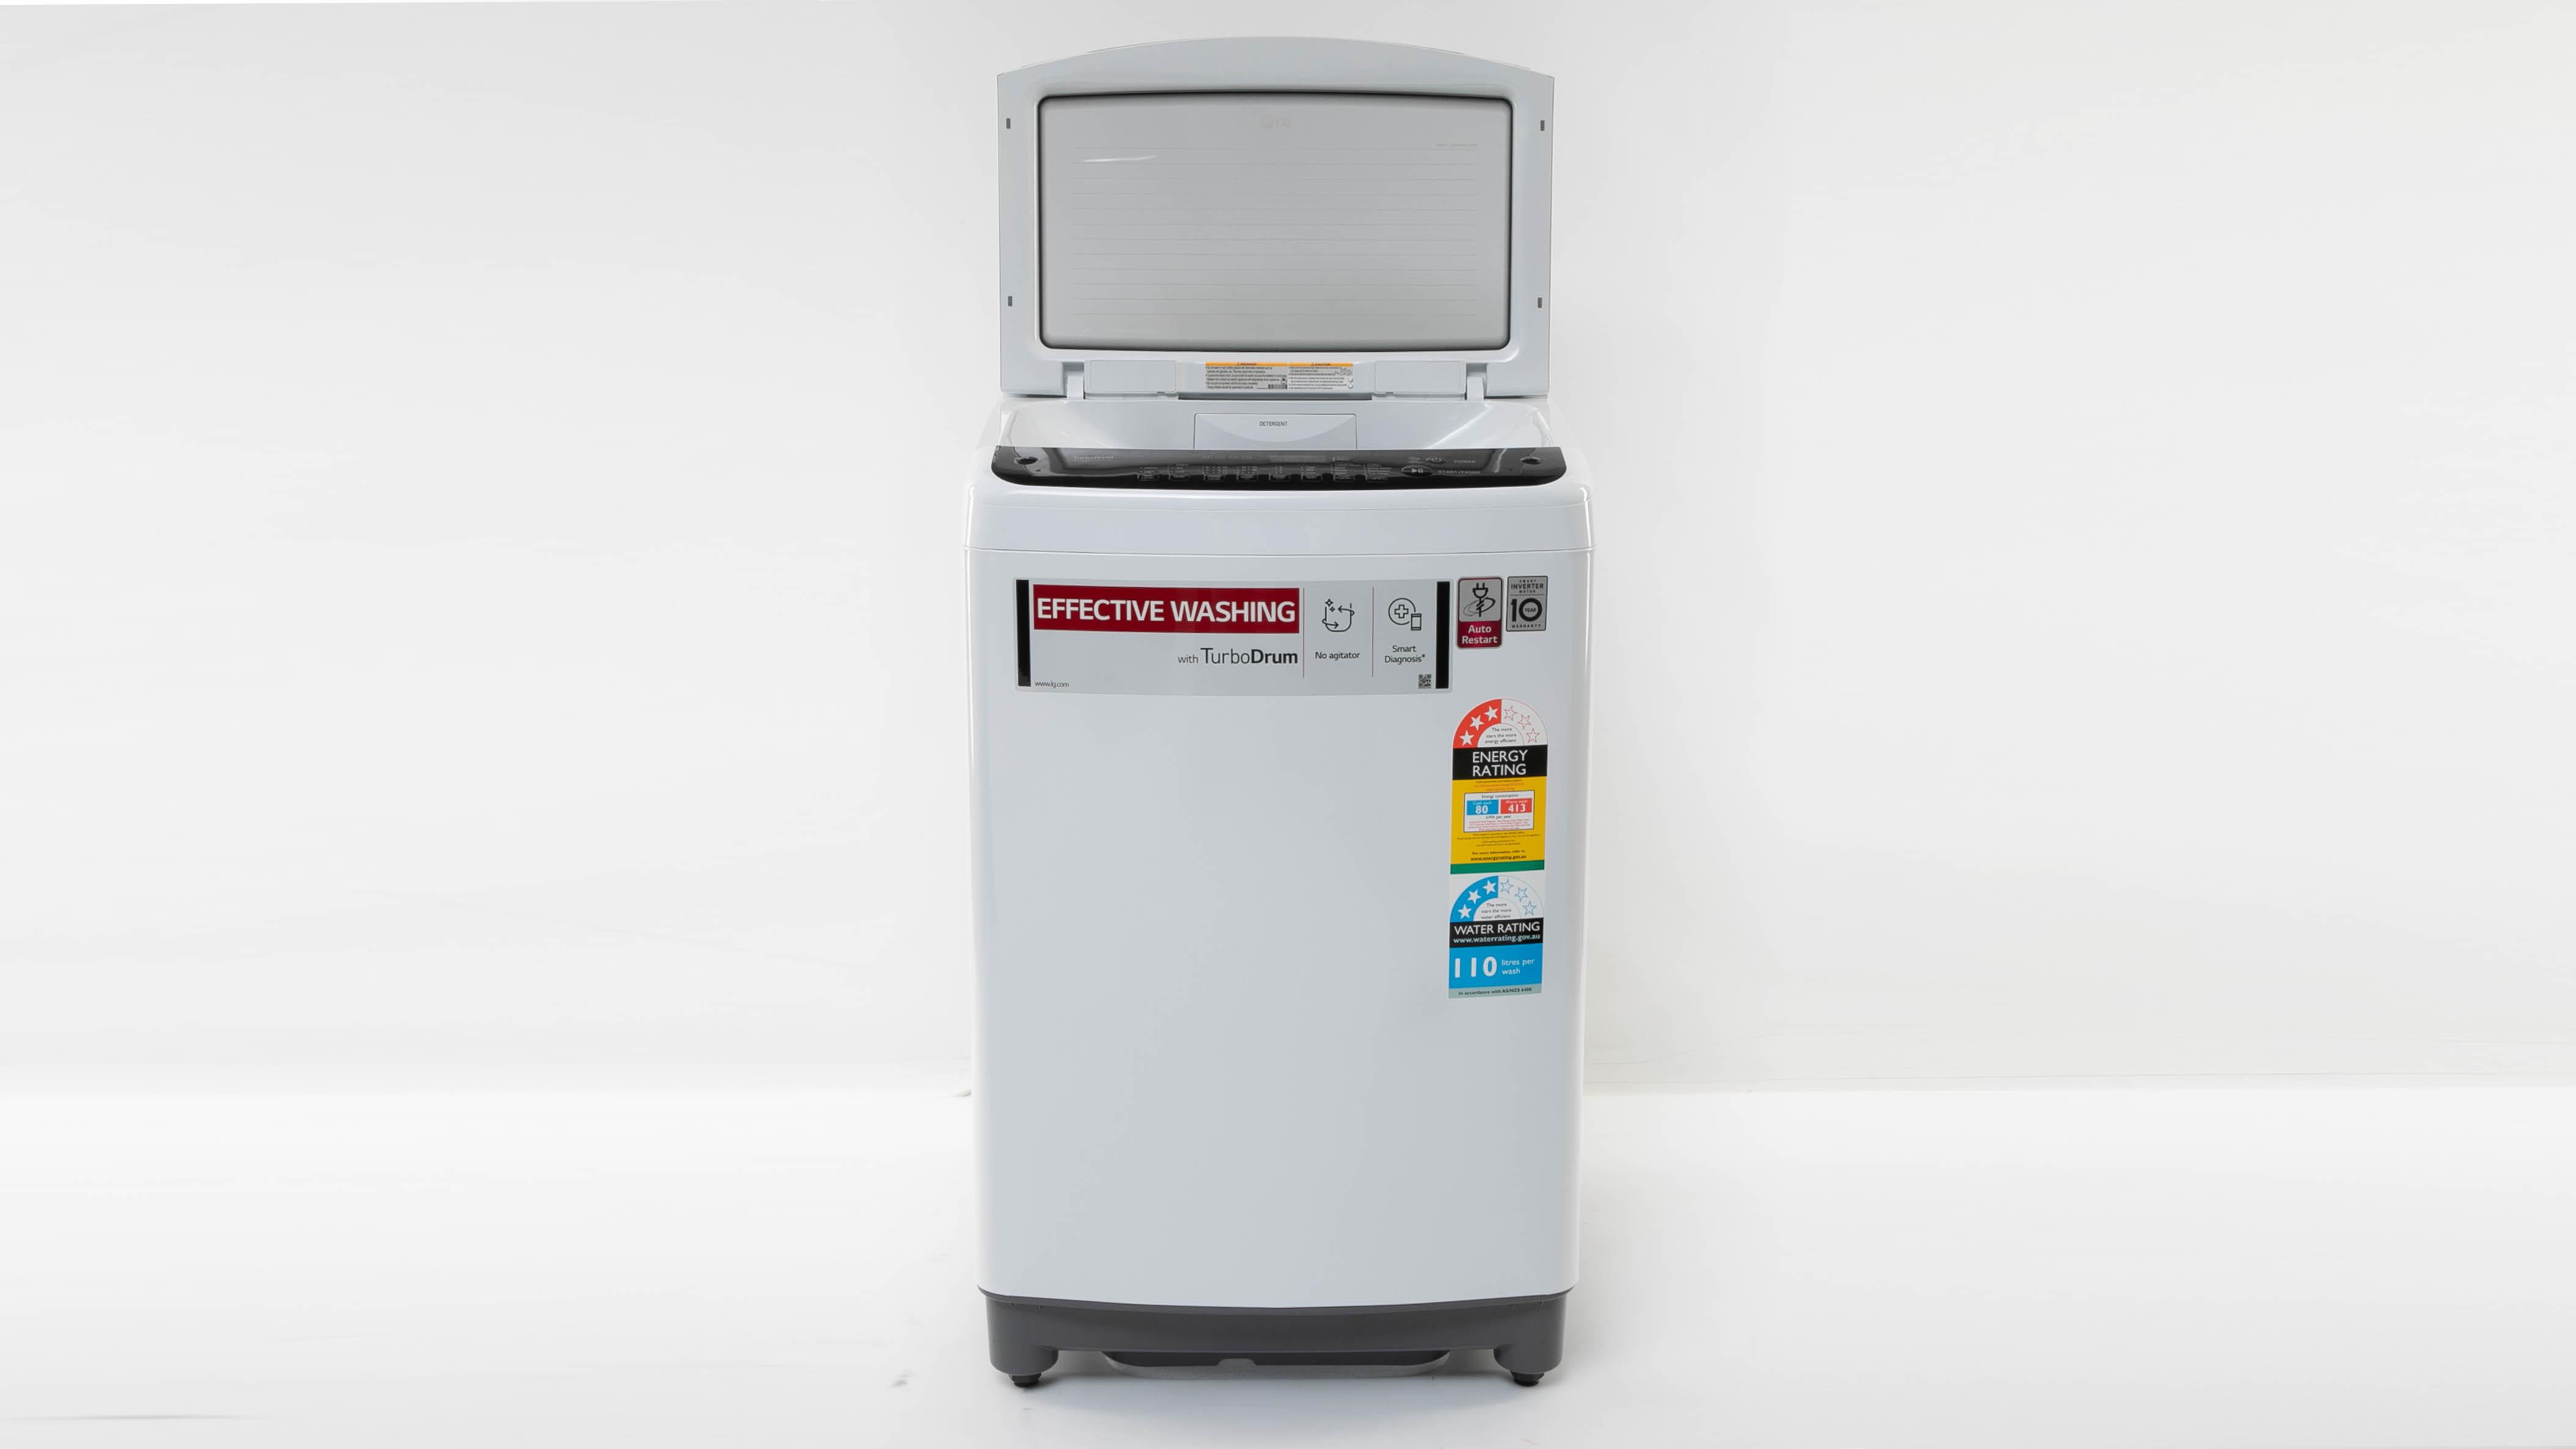 LG WTG7520